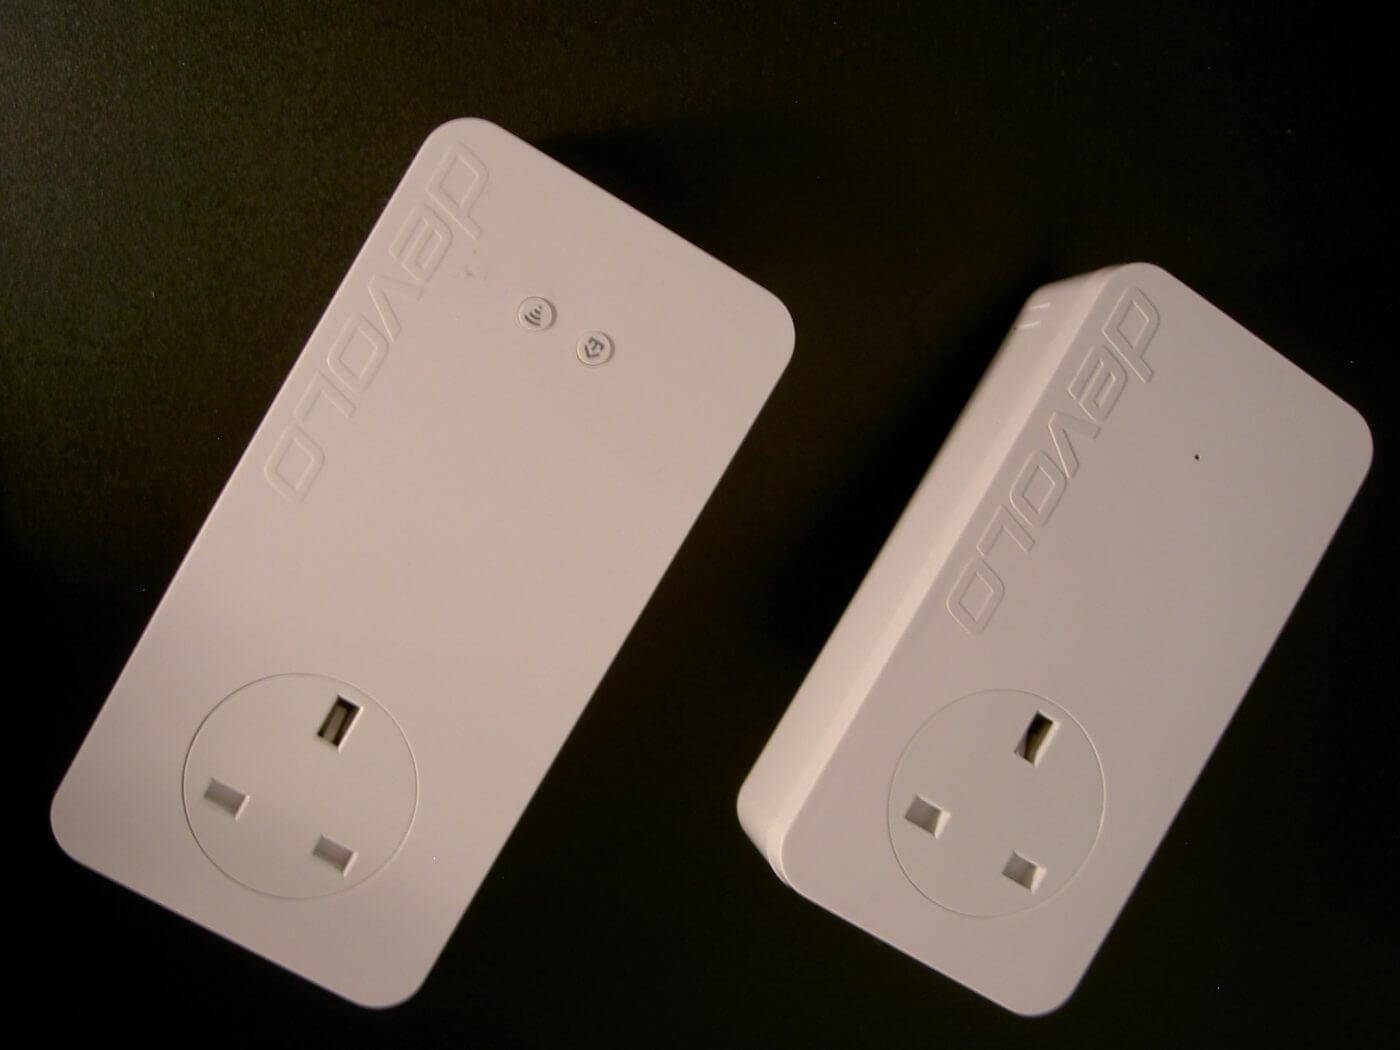 devolo dlan 1200 wifi ac starter kit review geek news. Black Bedroom Furniture Sets. Home Design Ideas